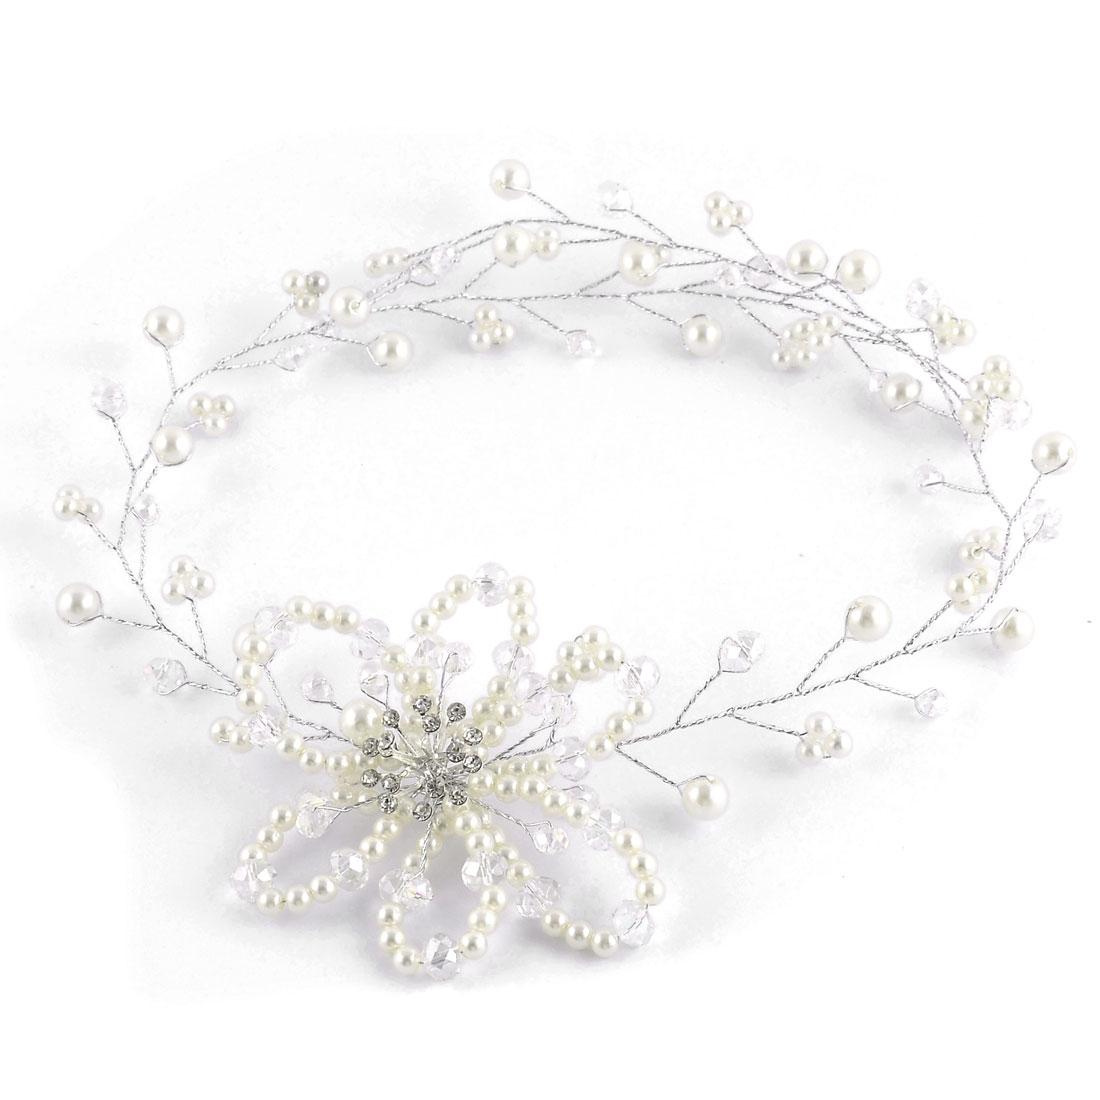 Bridal Lady Flower Design Imitation Pearl Rhinestone Detailed Headband Hair Band